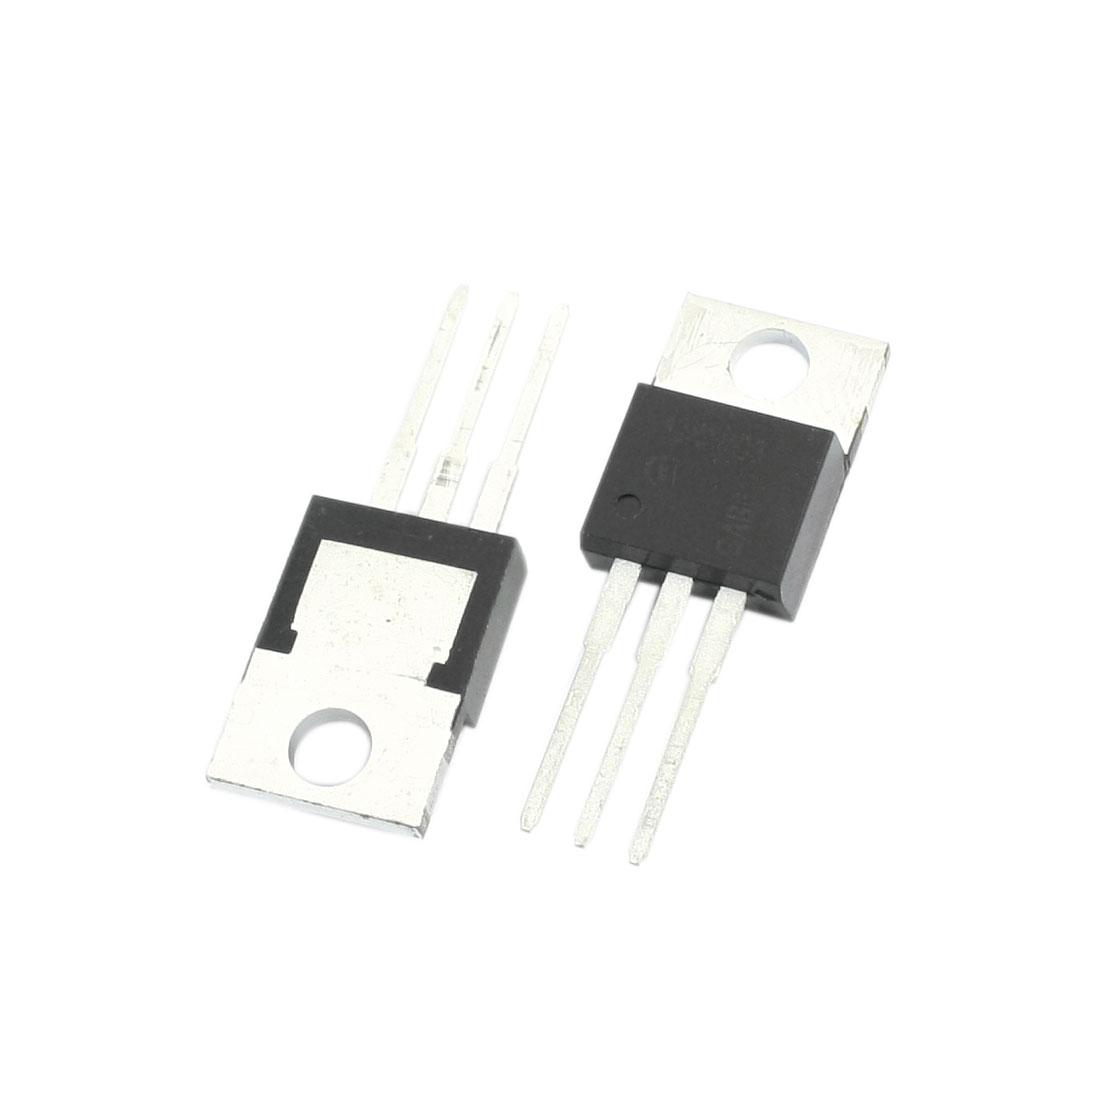 2Pcs SPP12N50C3 560V 11.6A N Channel MOS Field Effect Power Transistor